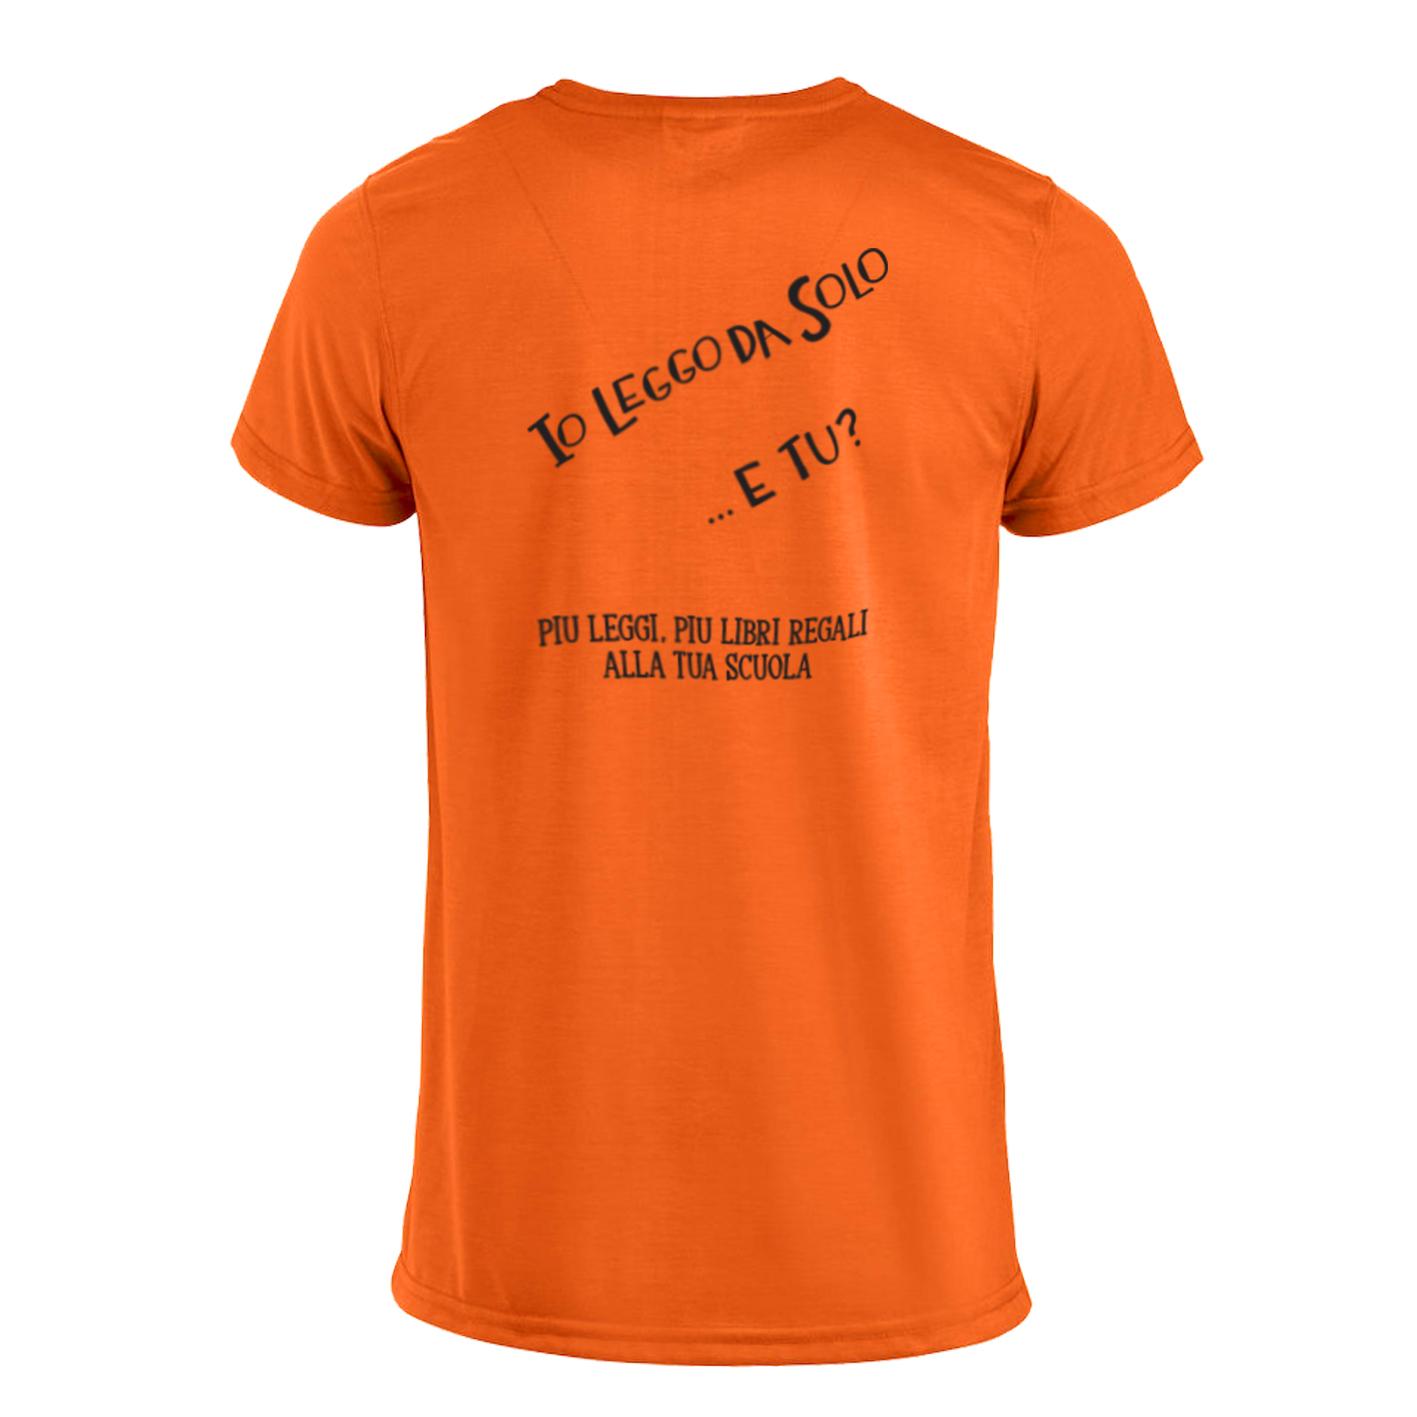 T-shirt-IoLeggodasolo-DeAgostini